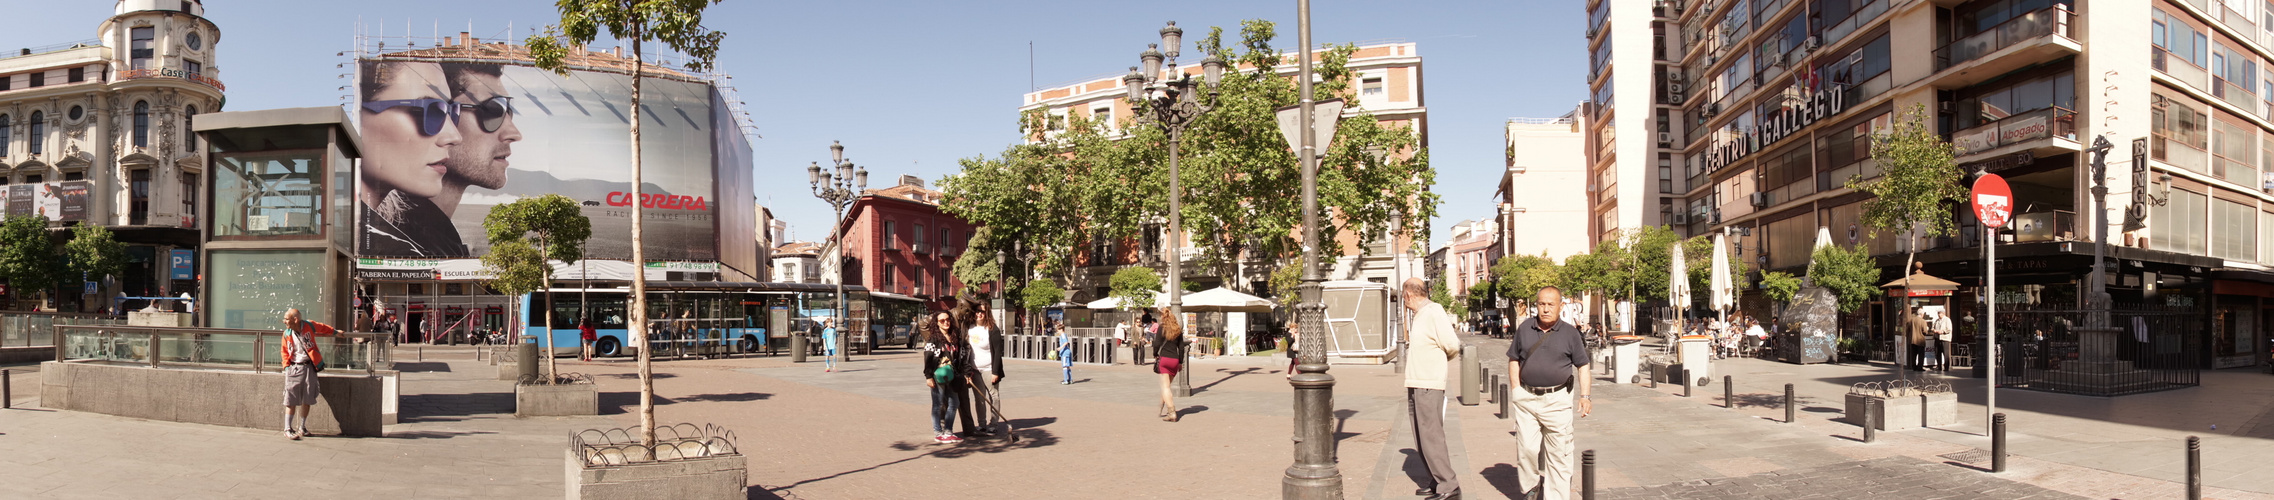 Madrid, Plaza de Santa Ana